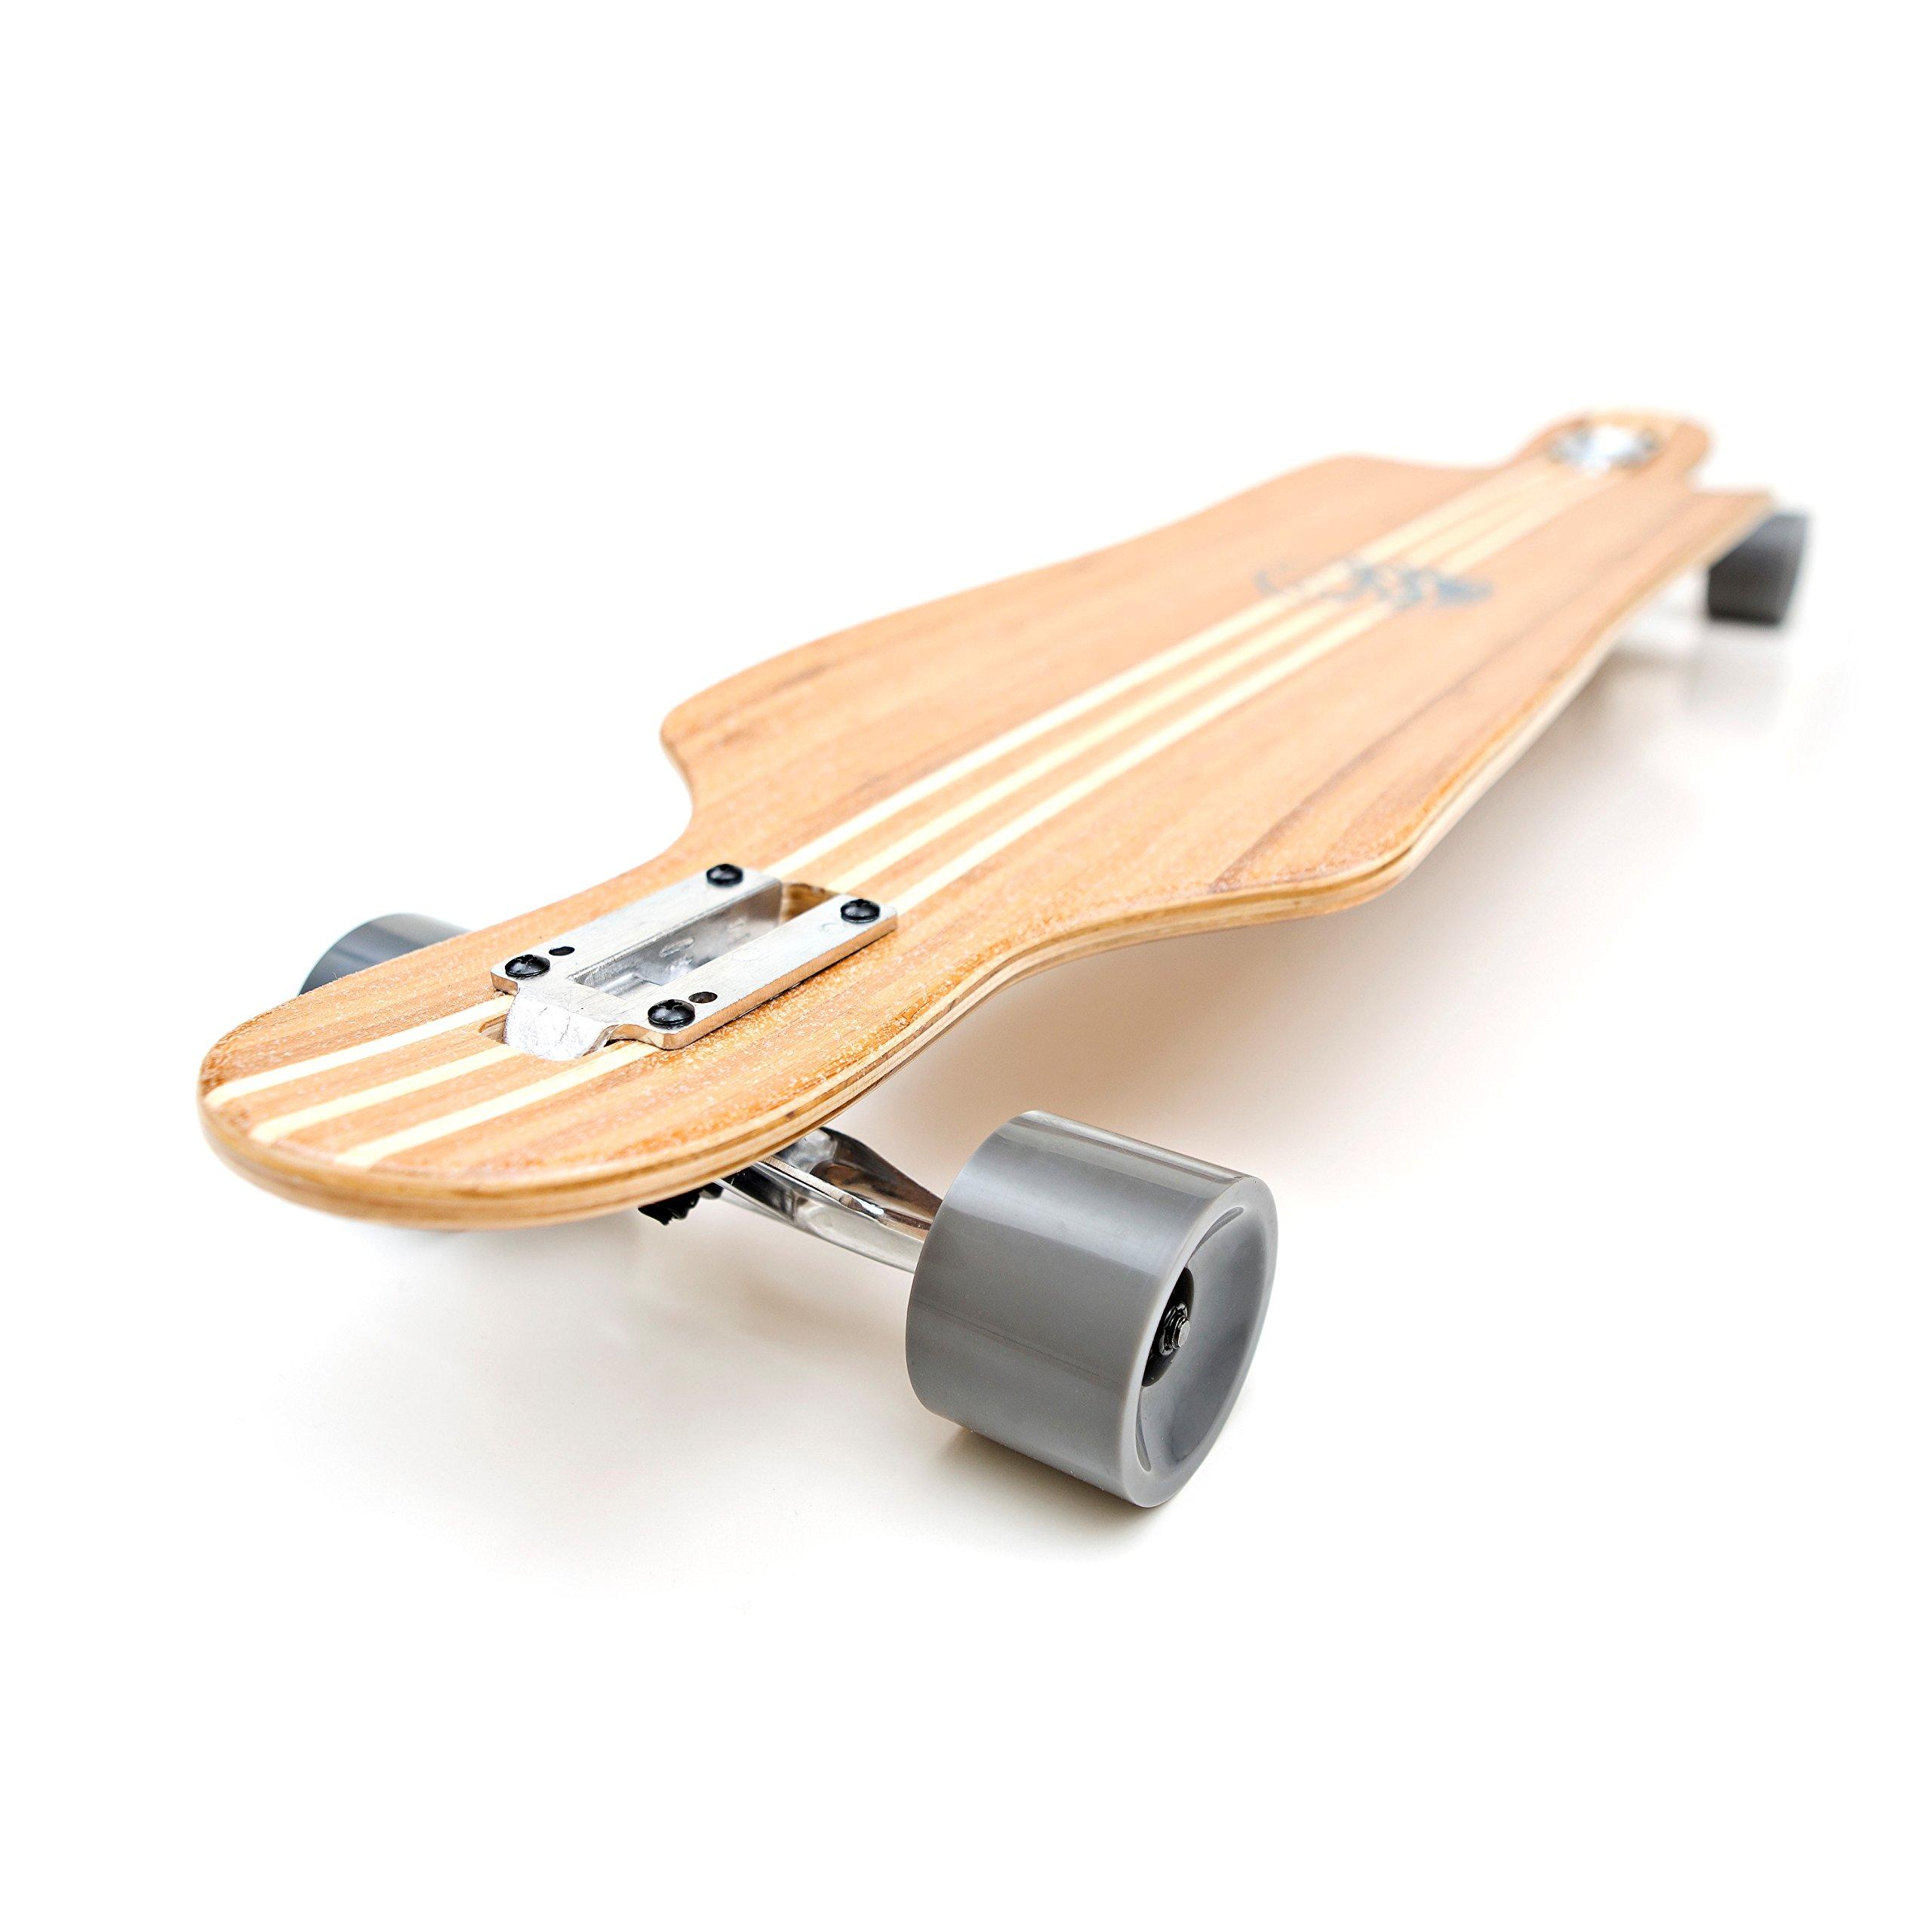 White Wave Bamboo Longboard Skateboard (Mayhem) by Whitewave (Image #1)